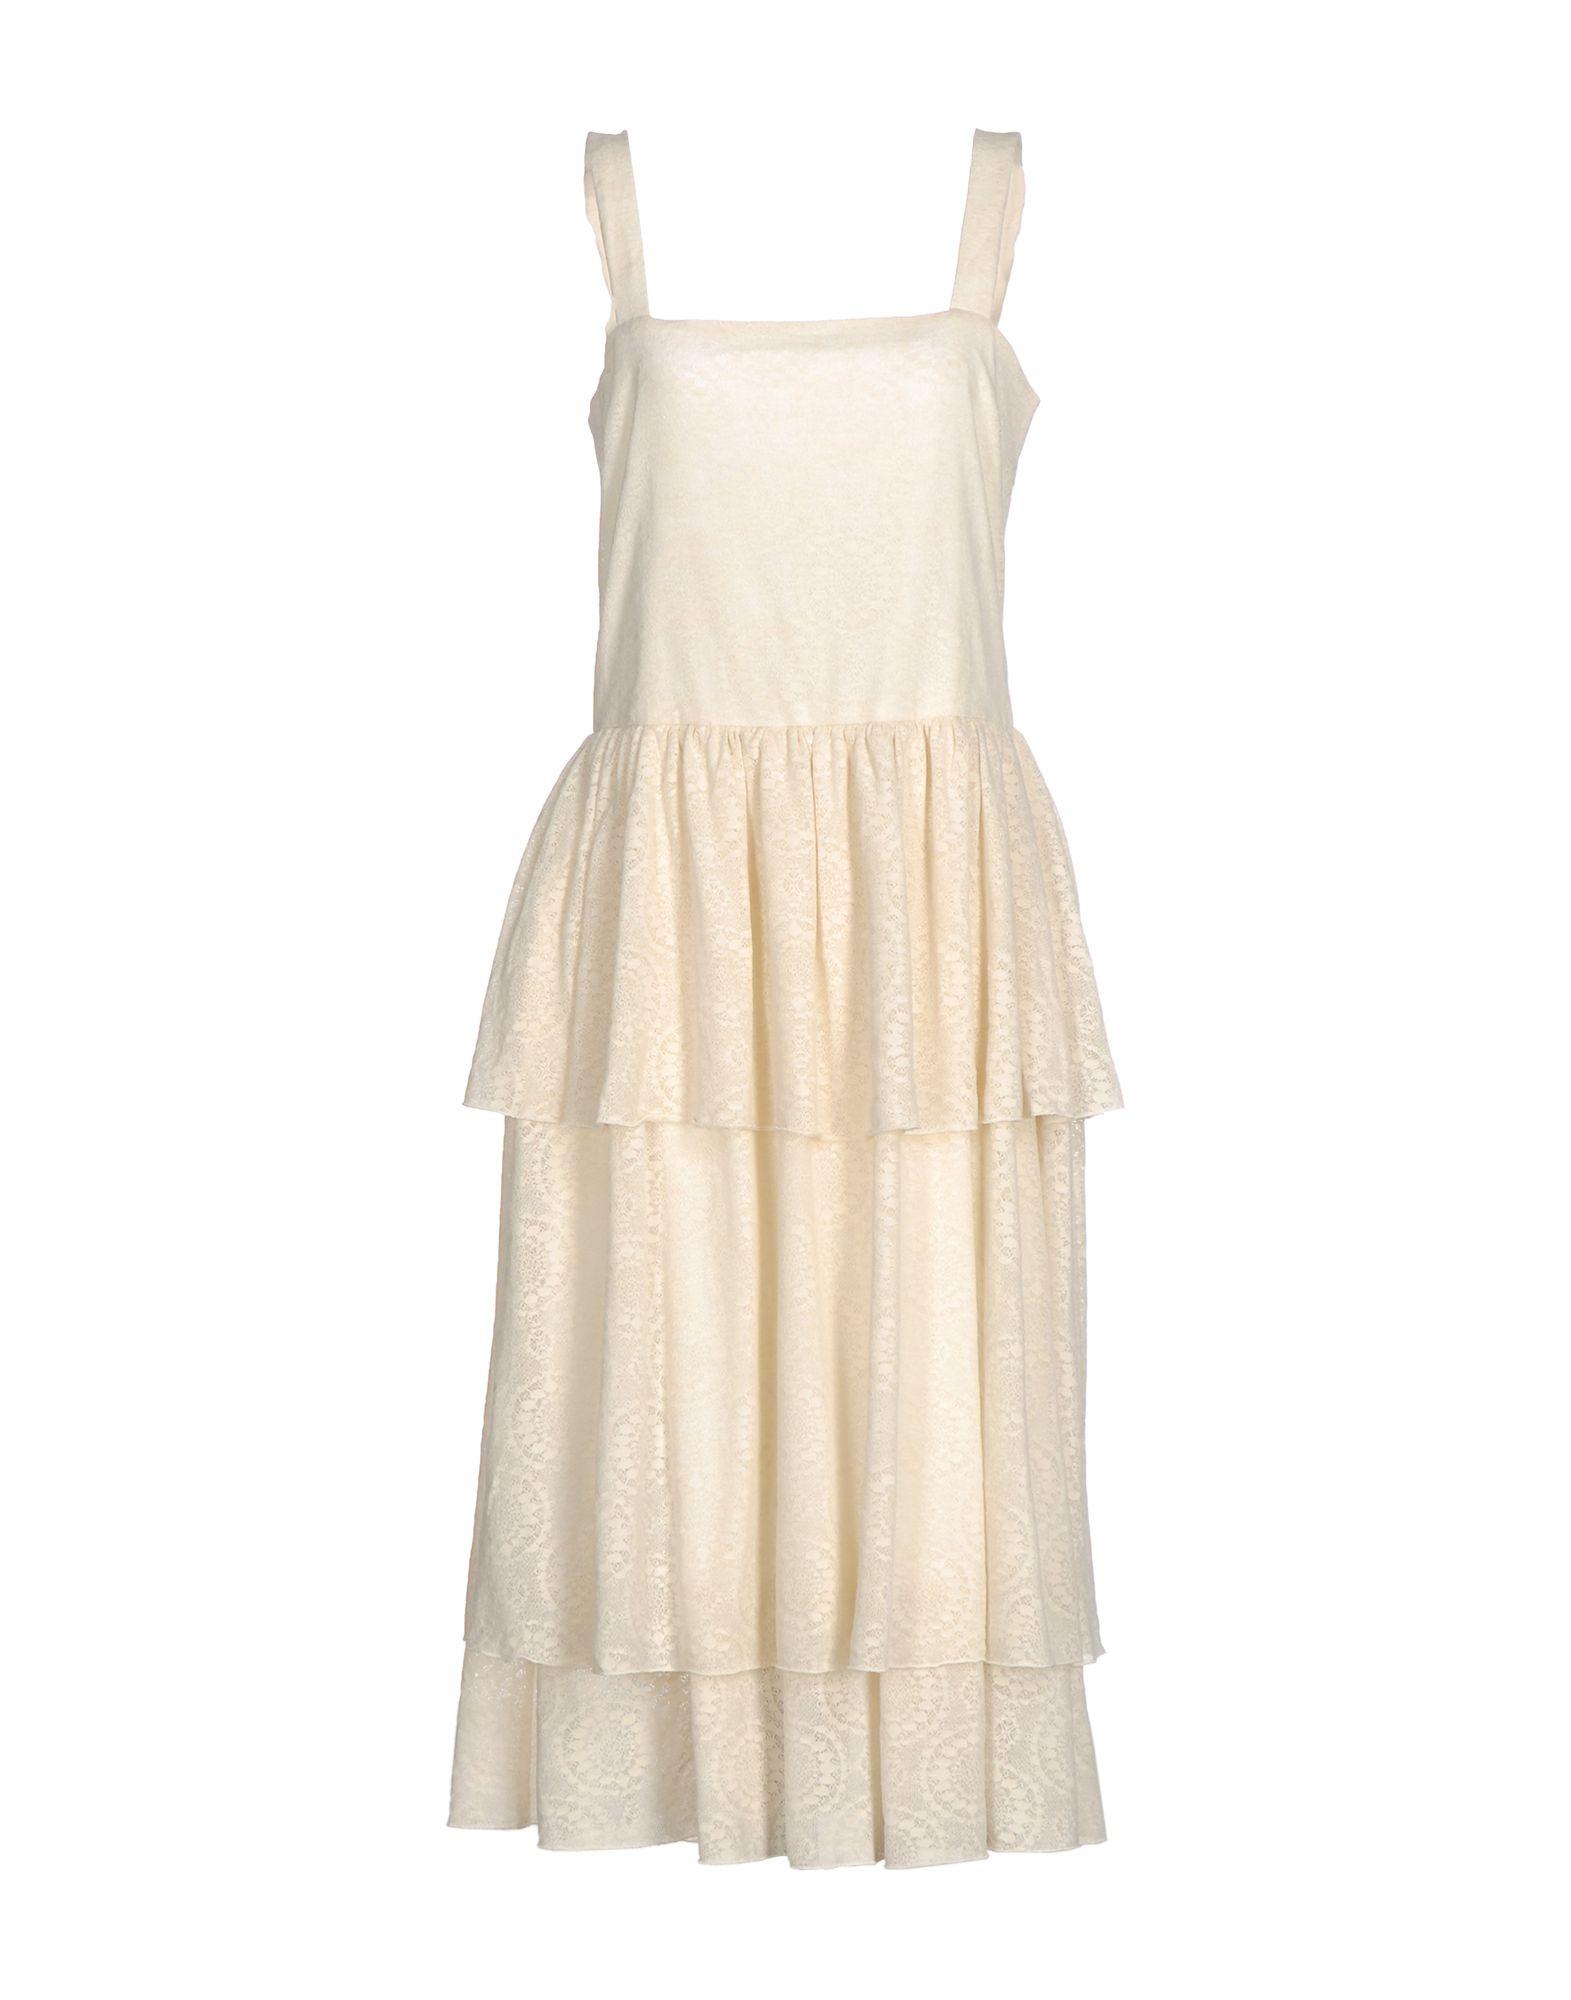 LA KICCA Платье длиной 3/4 la fabrique платье длиной 3 4